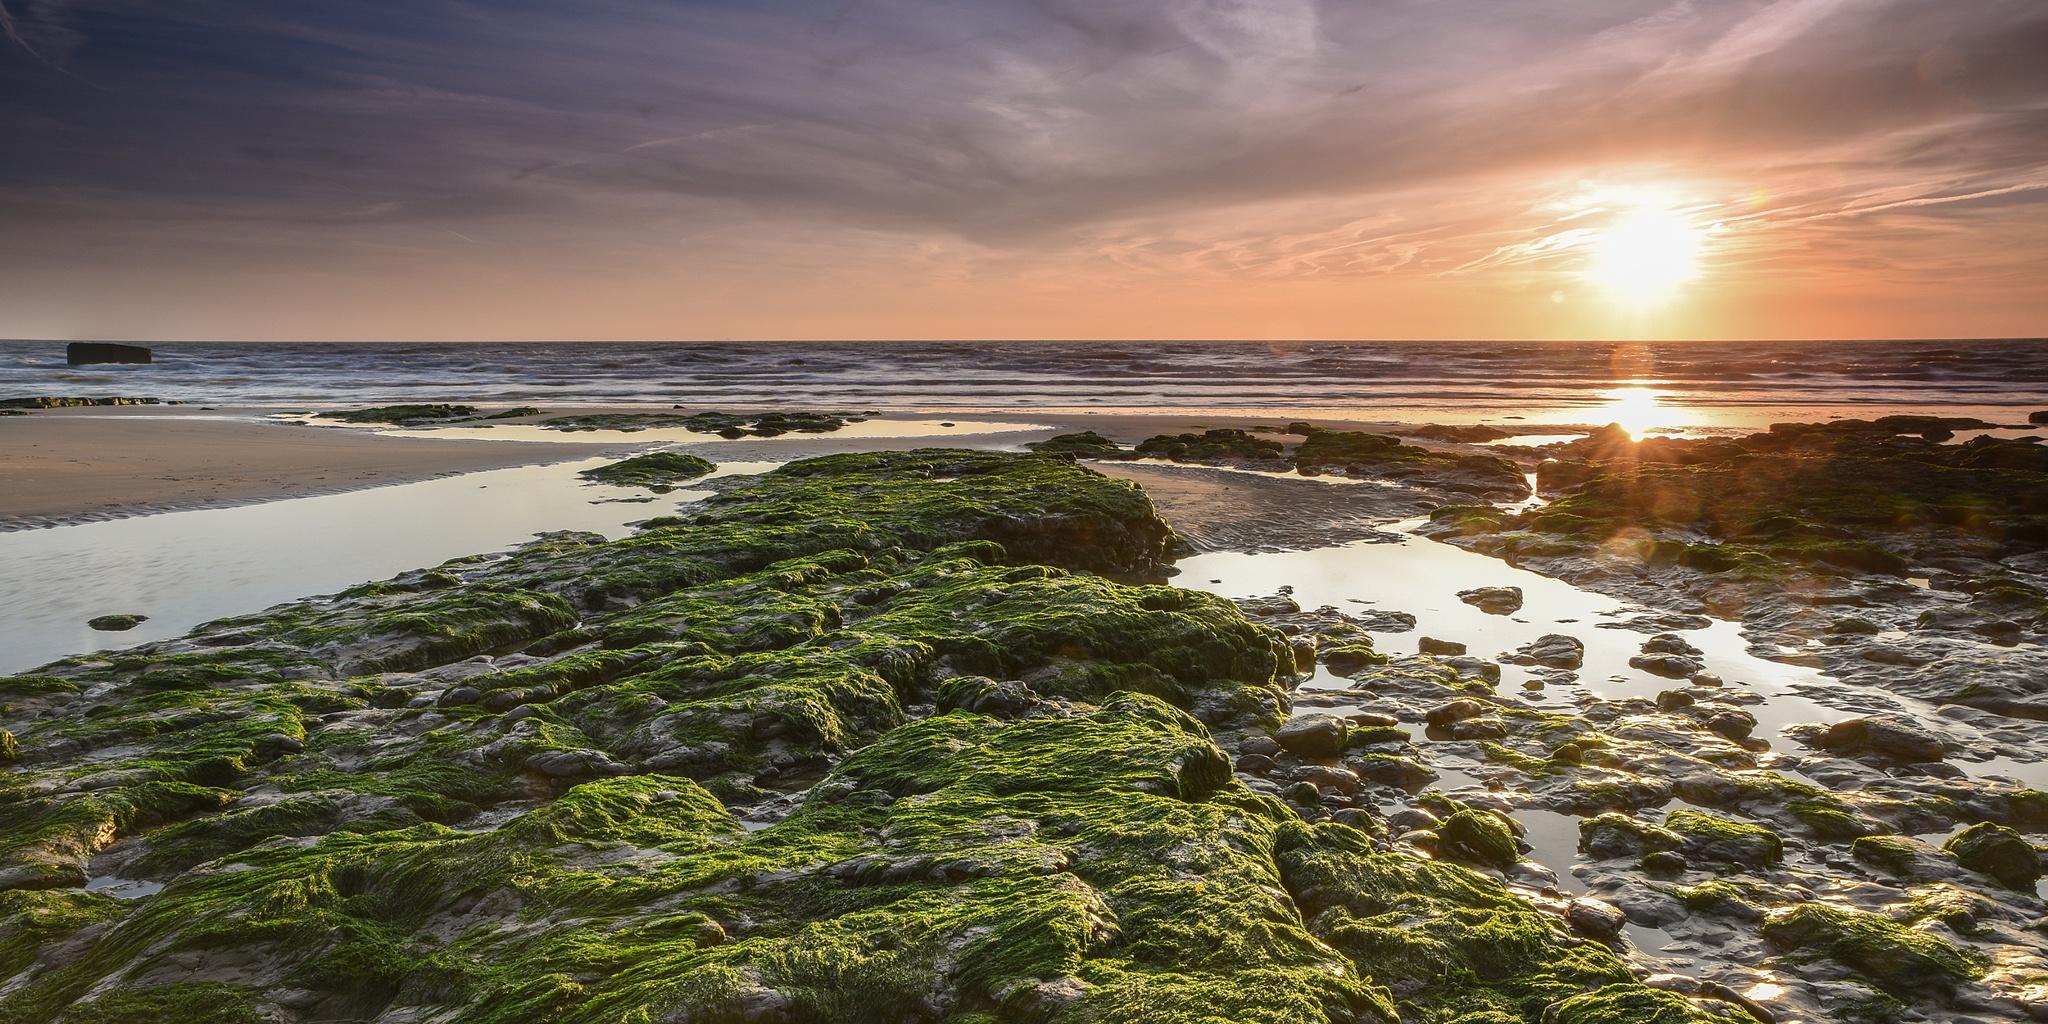 Sunrise at Bawdsey by jonkennard